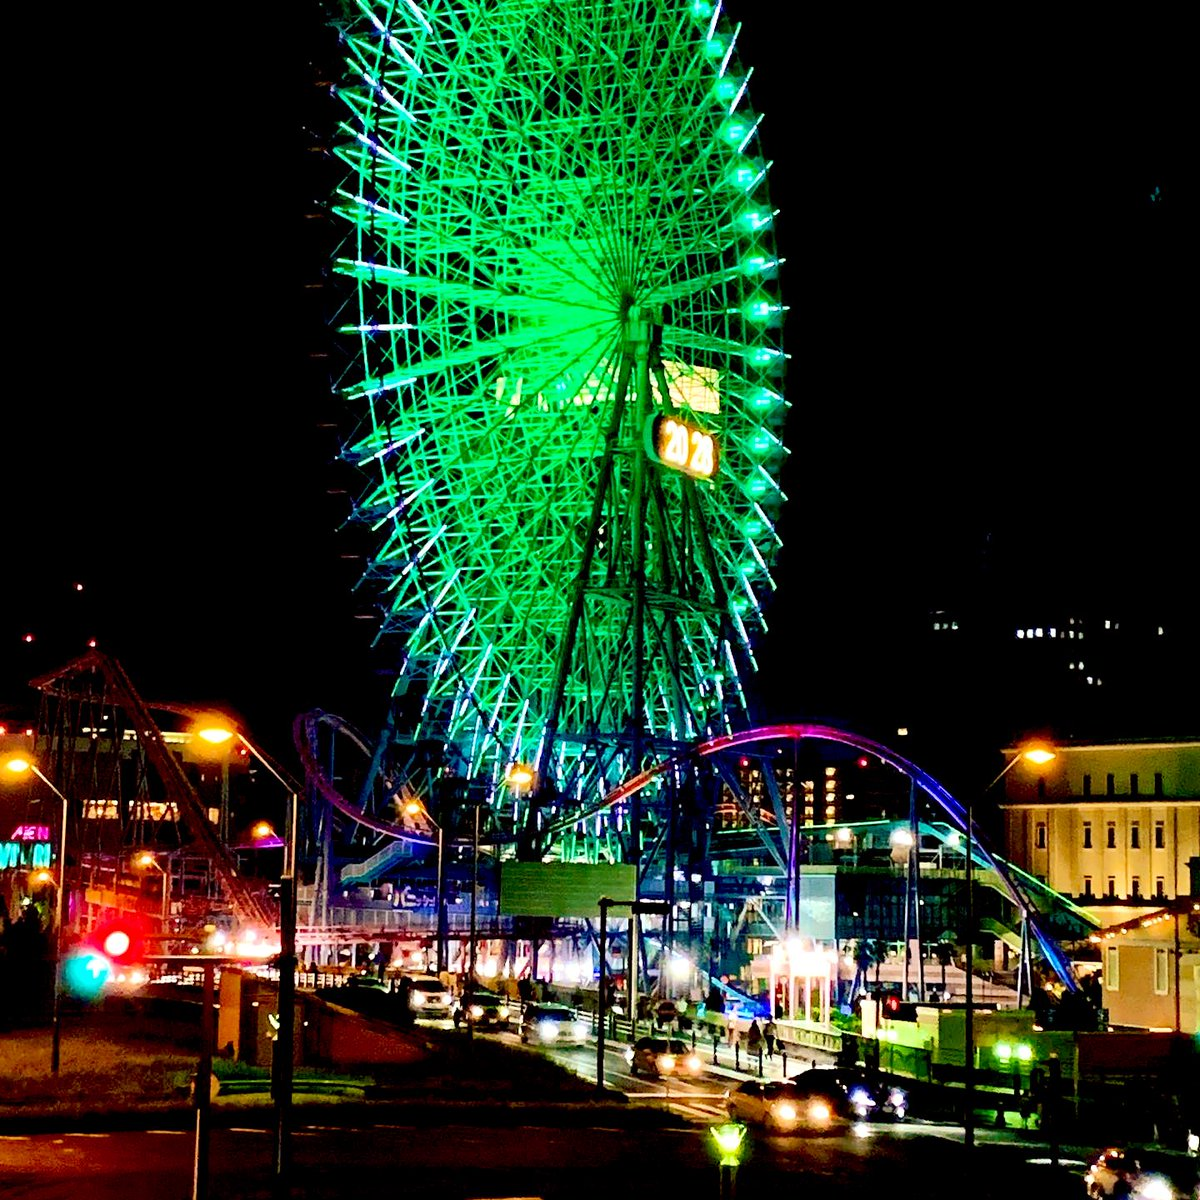 test ツイッターメディア - FCイベント楽しかった 横浜の観覧車綺麗   #FCイベント #蒼井翔太  #ダンス #トレイン #旅行記部 #楽しかった https://t.co/X3jVgUOOdq